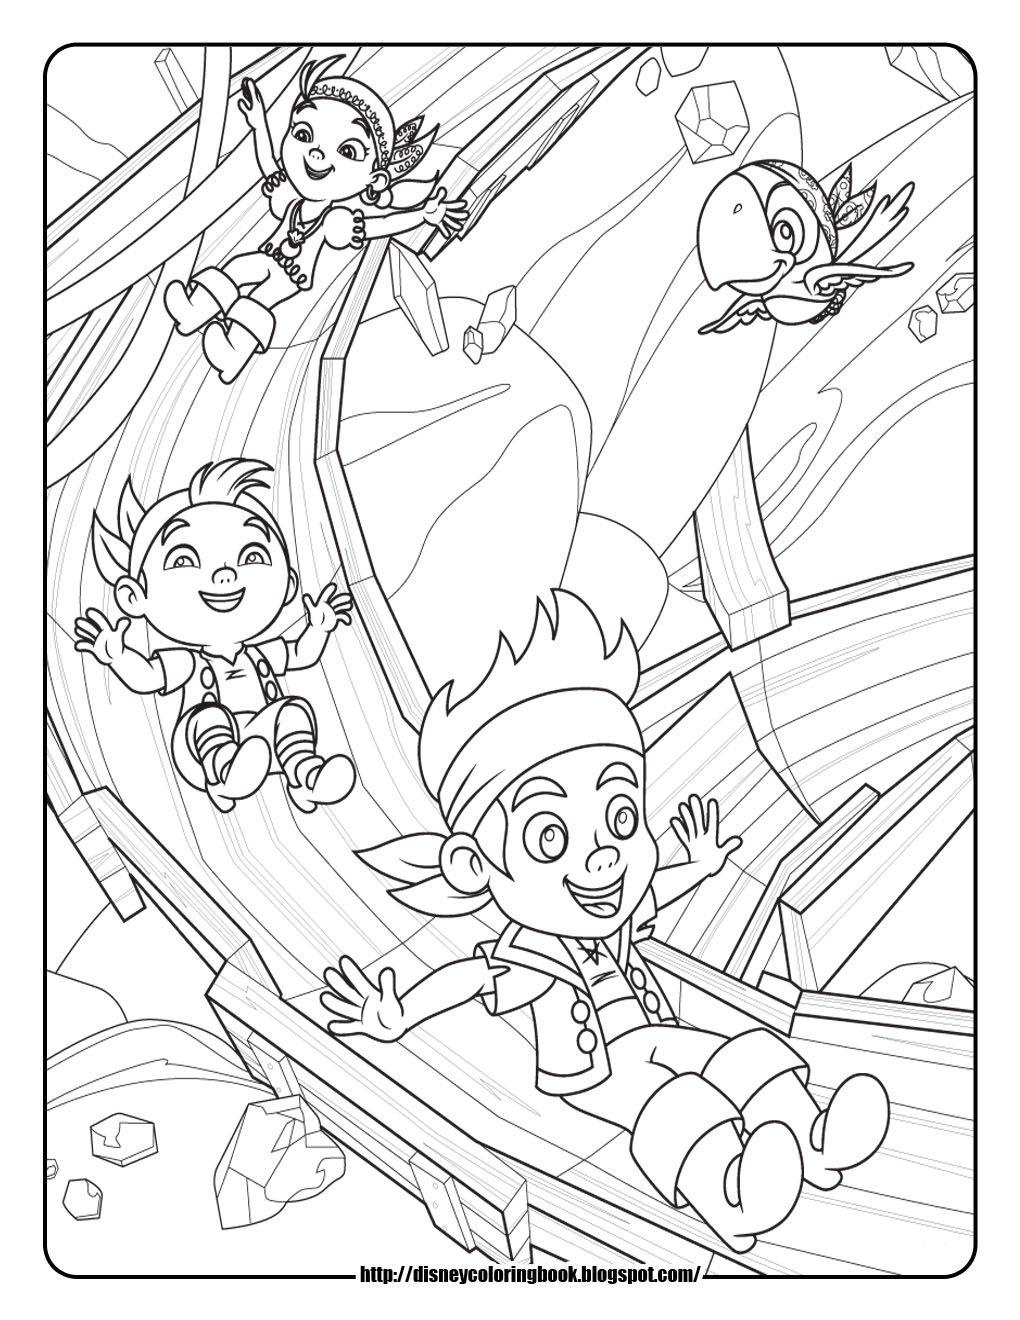 Jnp Slide Jpg 1020 1320 Pirate Coloring Pages Disney Coloring Pages Coloring Pages